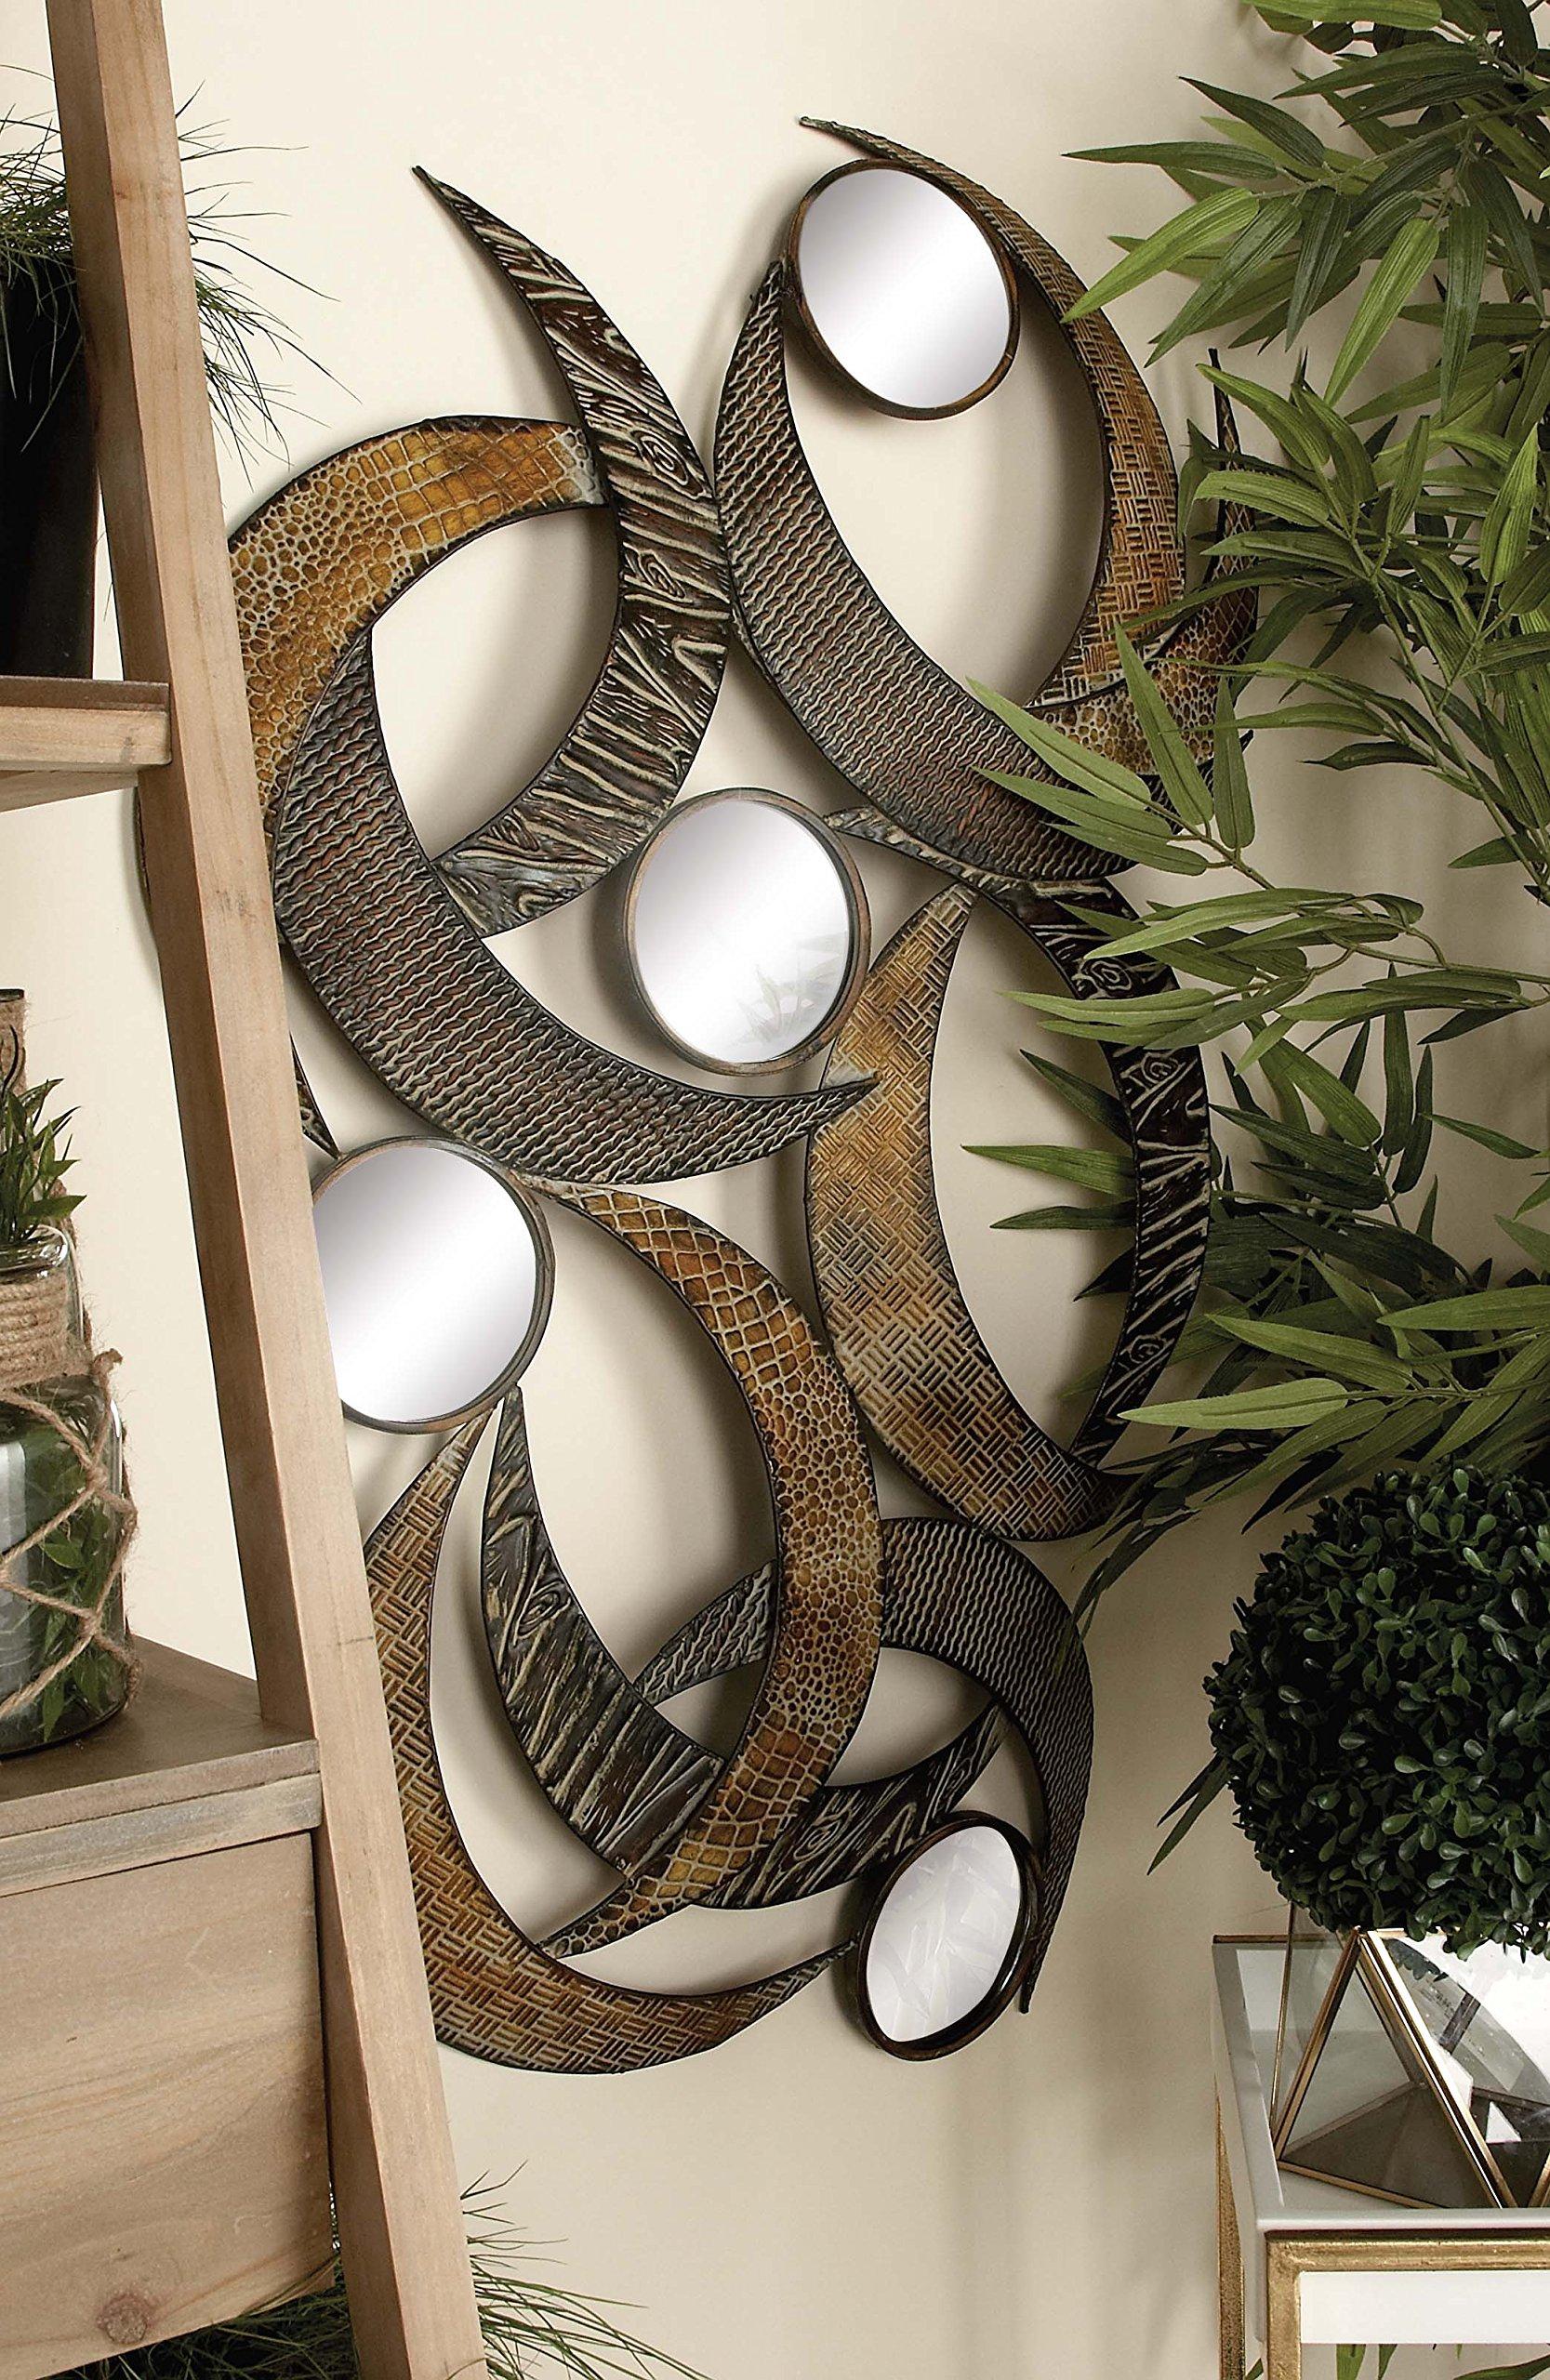 Deco 79 96663 Metal Mirror Wall Plaque Beautifully Sculptured, 24-Inch